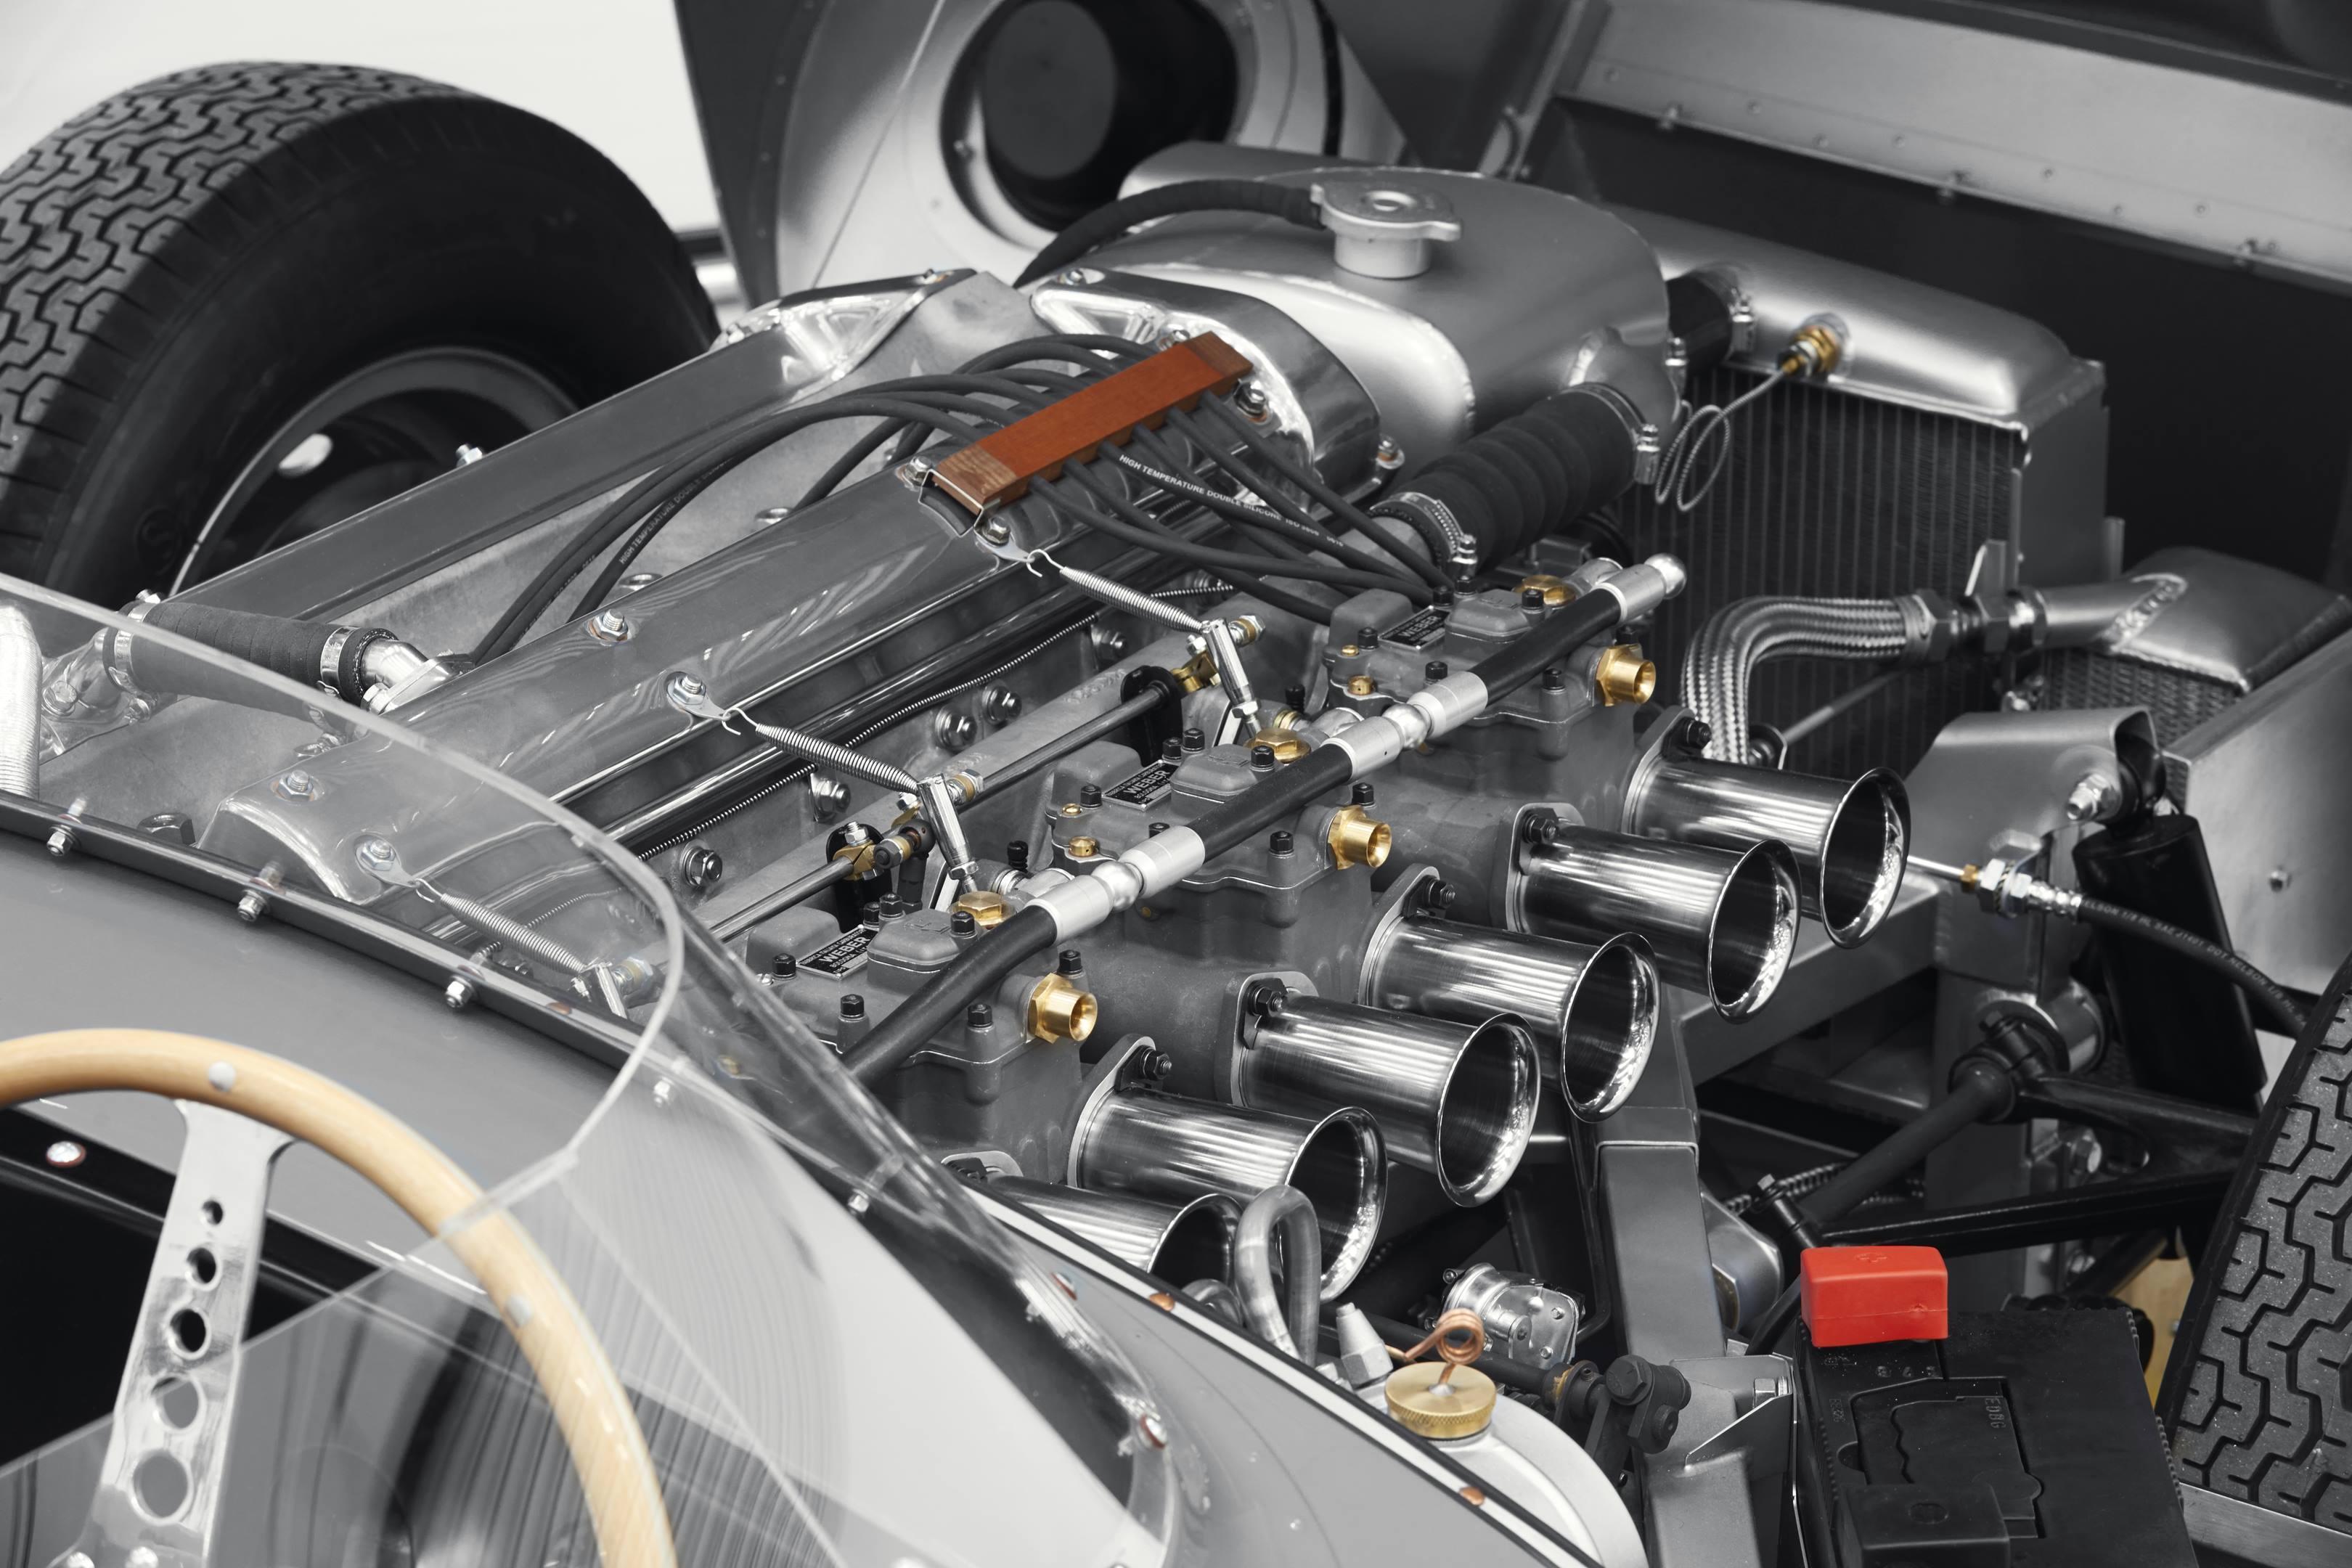 D-type engine